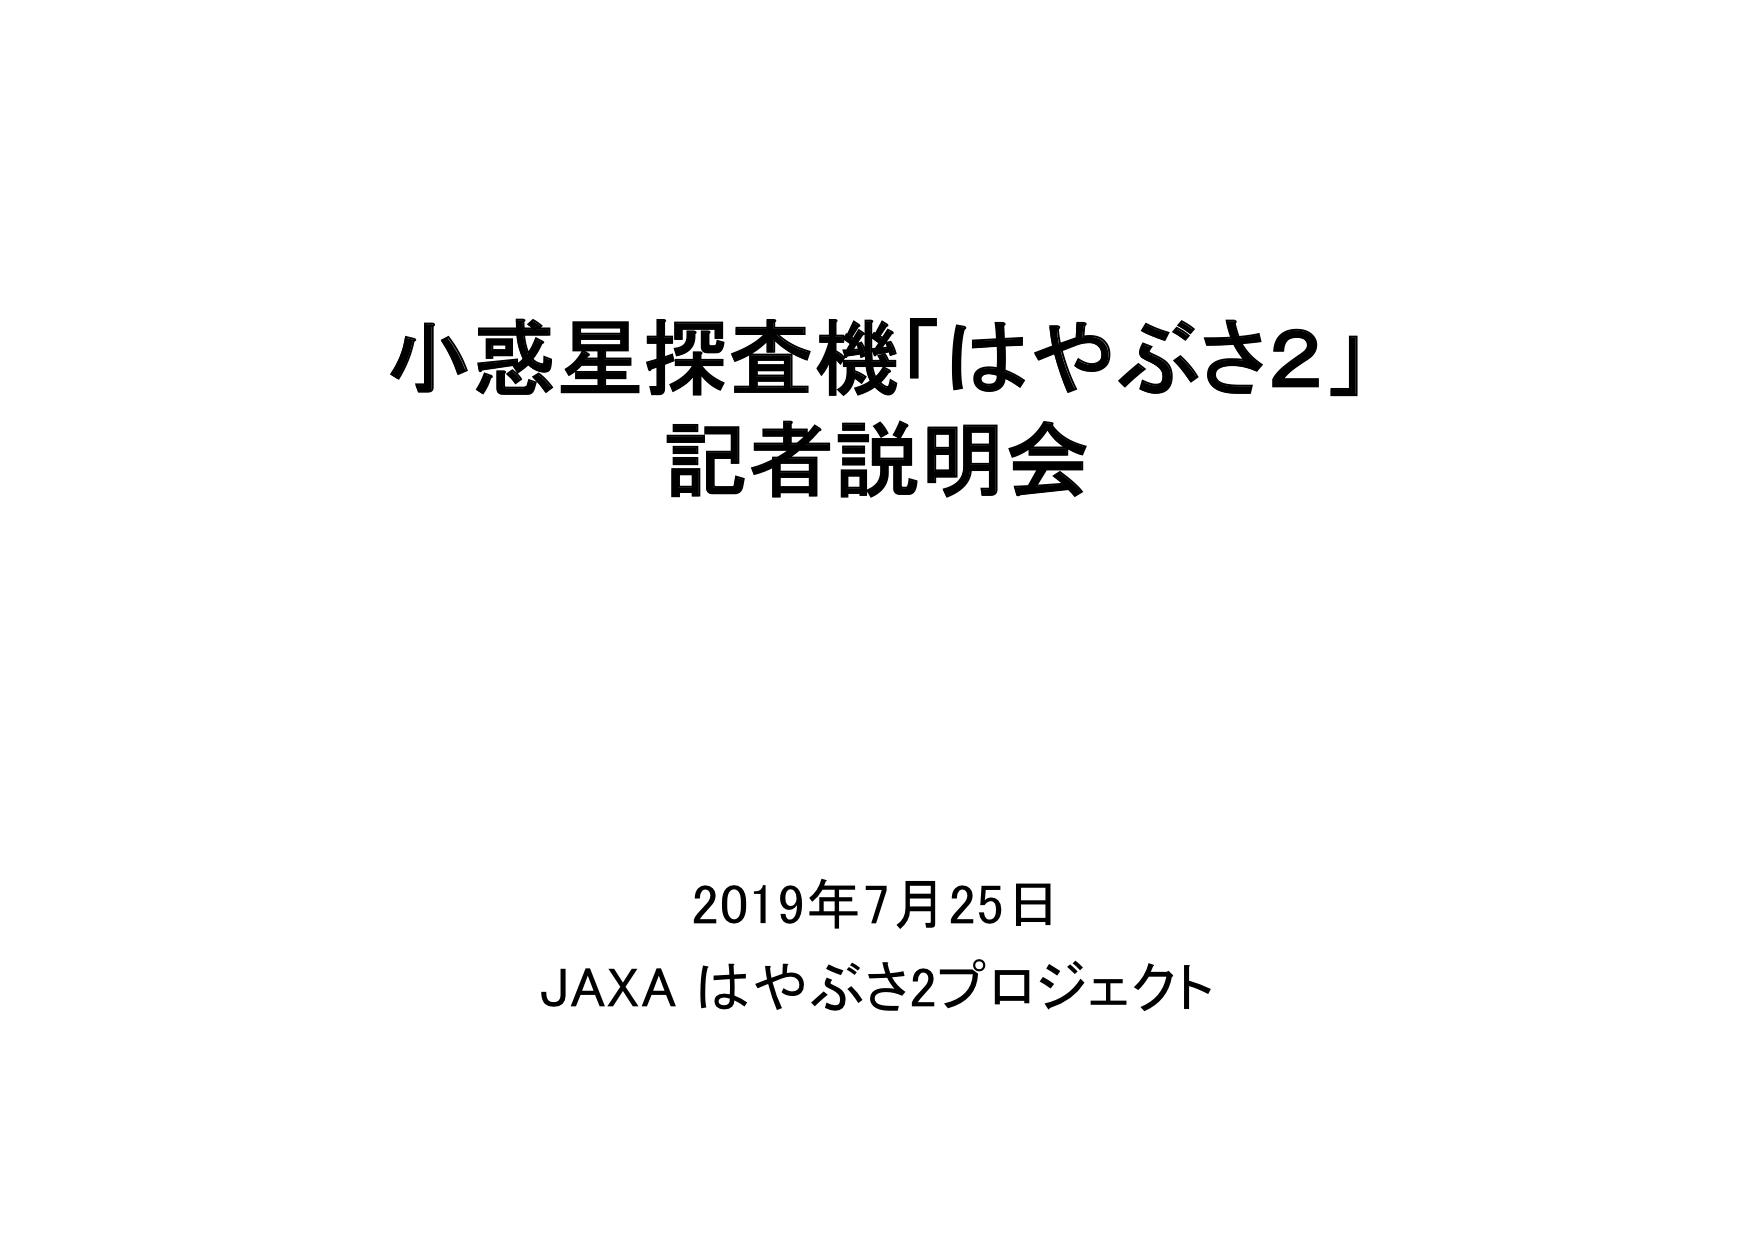 f:id:Imamura:20190725151035p:plain